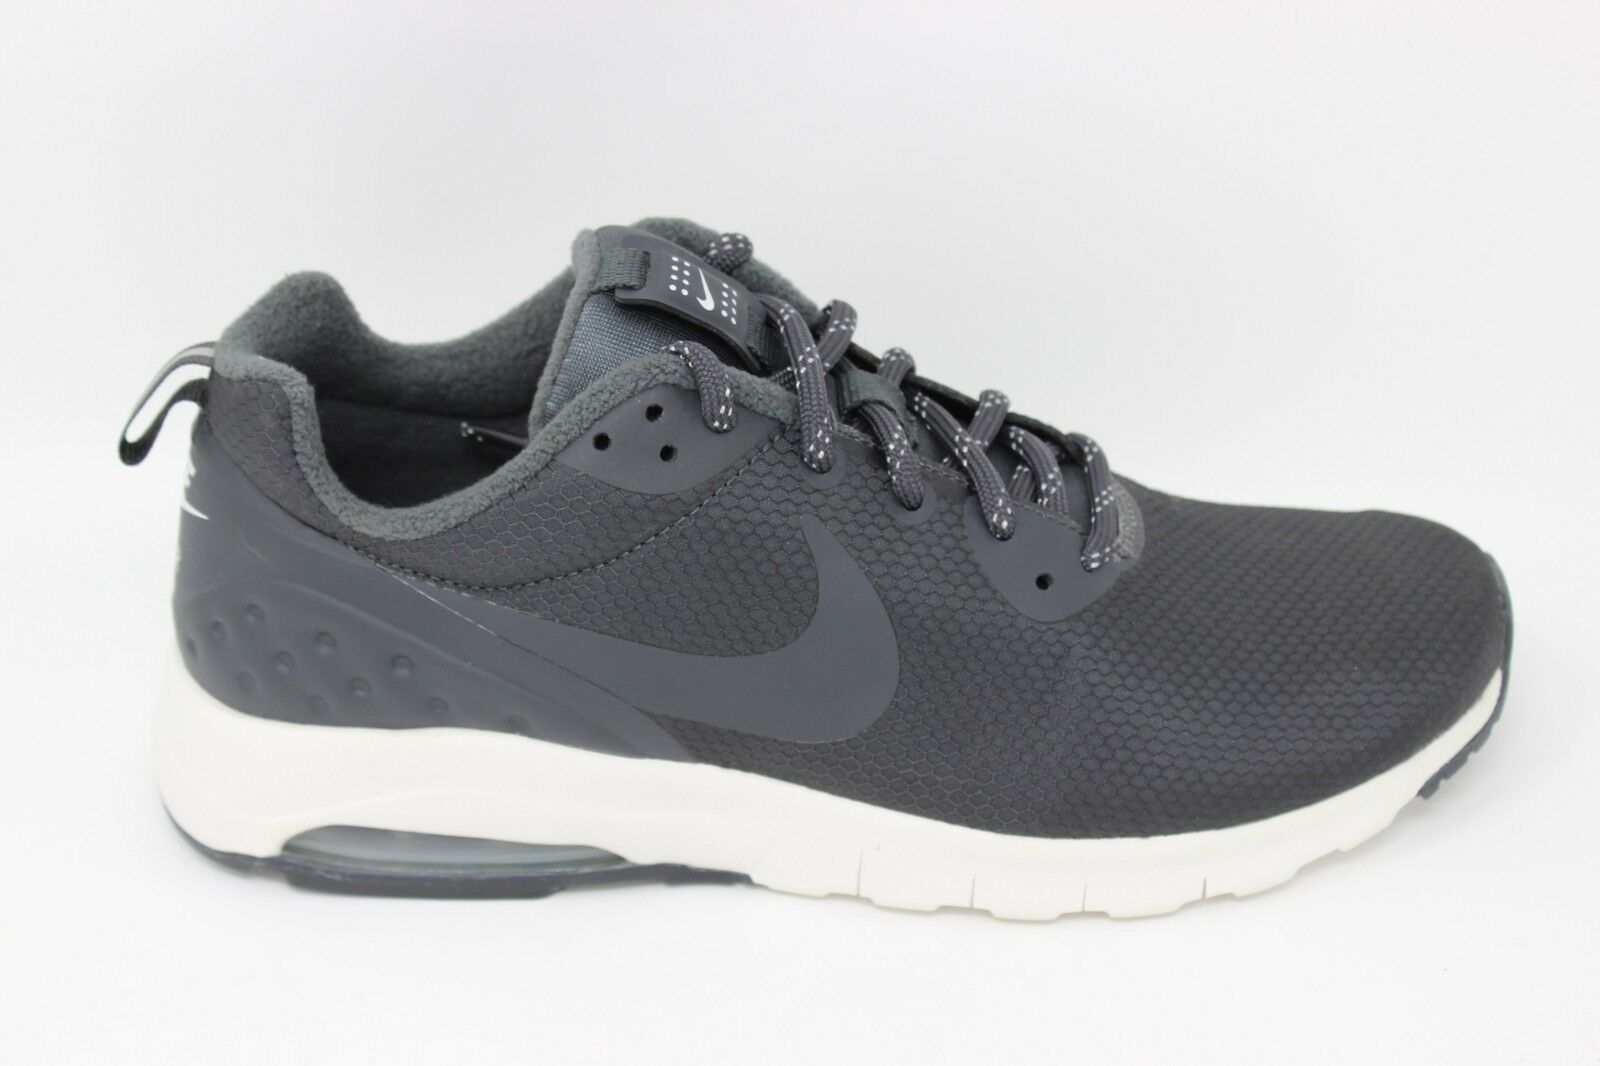 Nike Men's Air Max Motion LW SE 844836 002 Anthracite/Phantom Brand New Seasonal price cuts, discount benefits